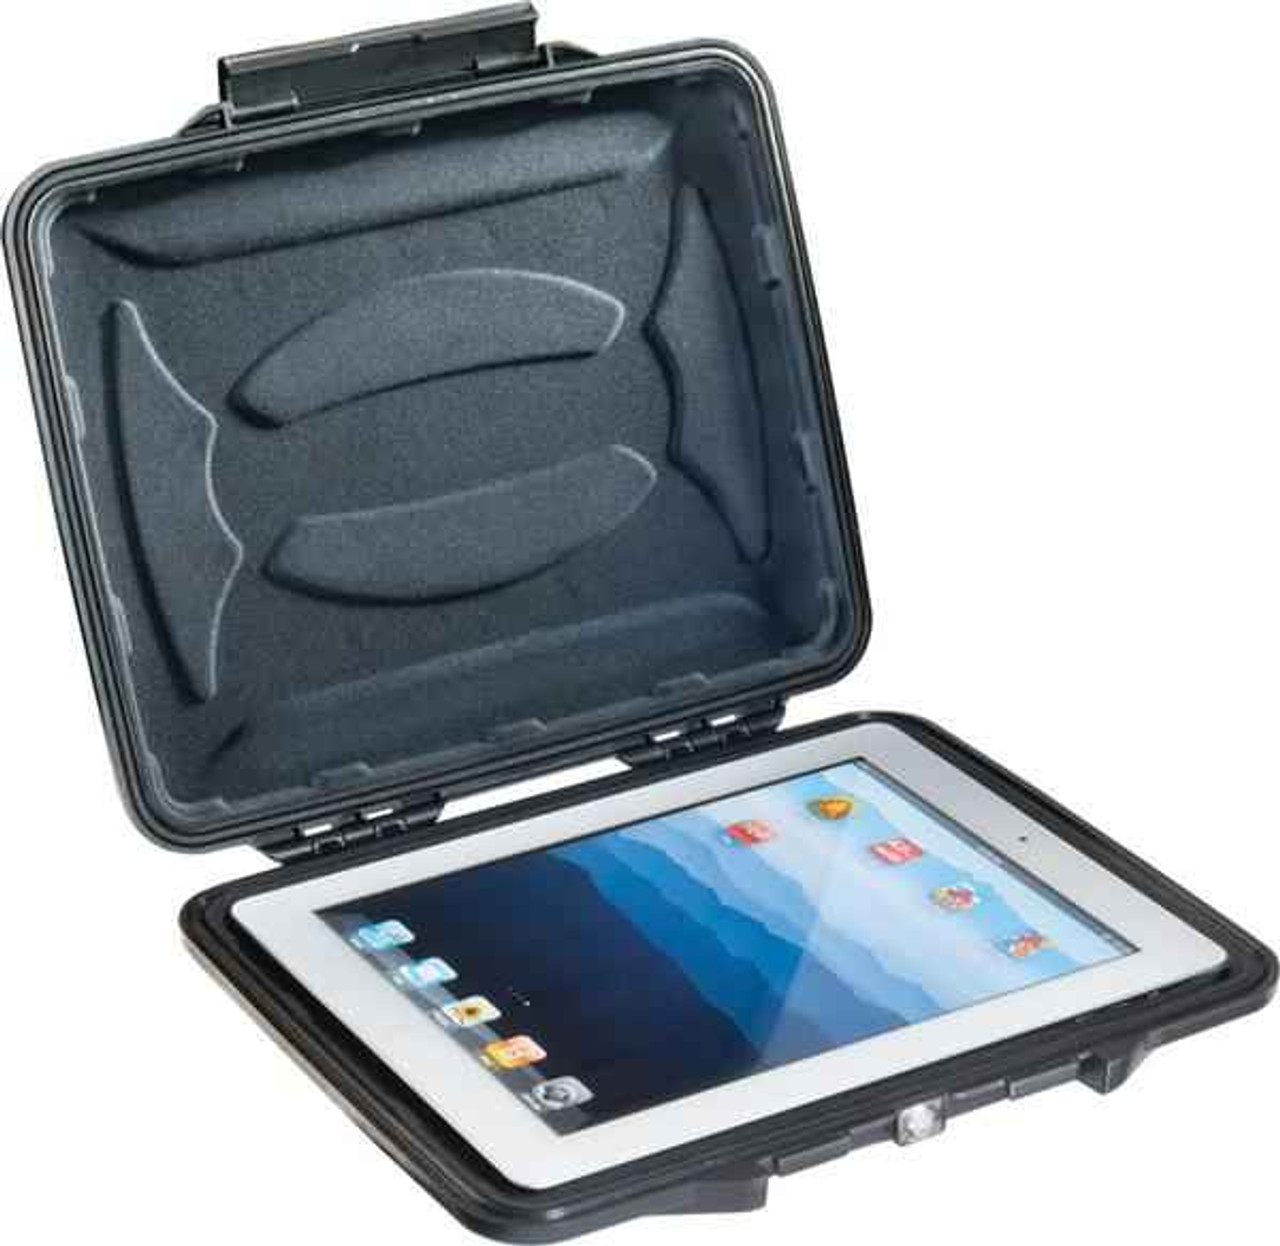 Pelican HardBack Case with Tablet Liner